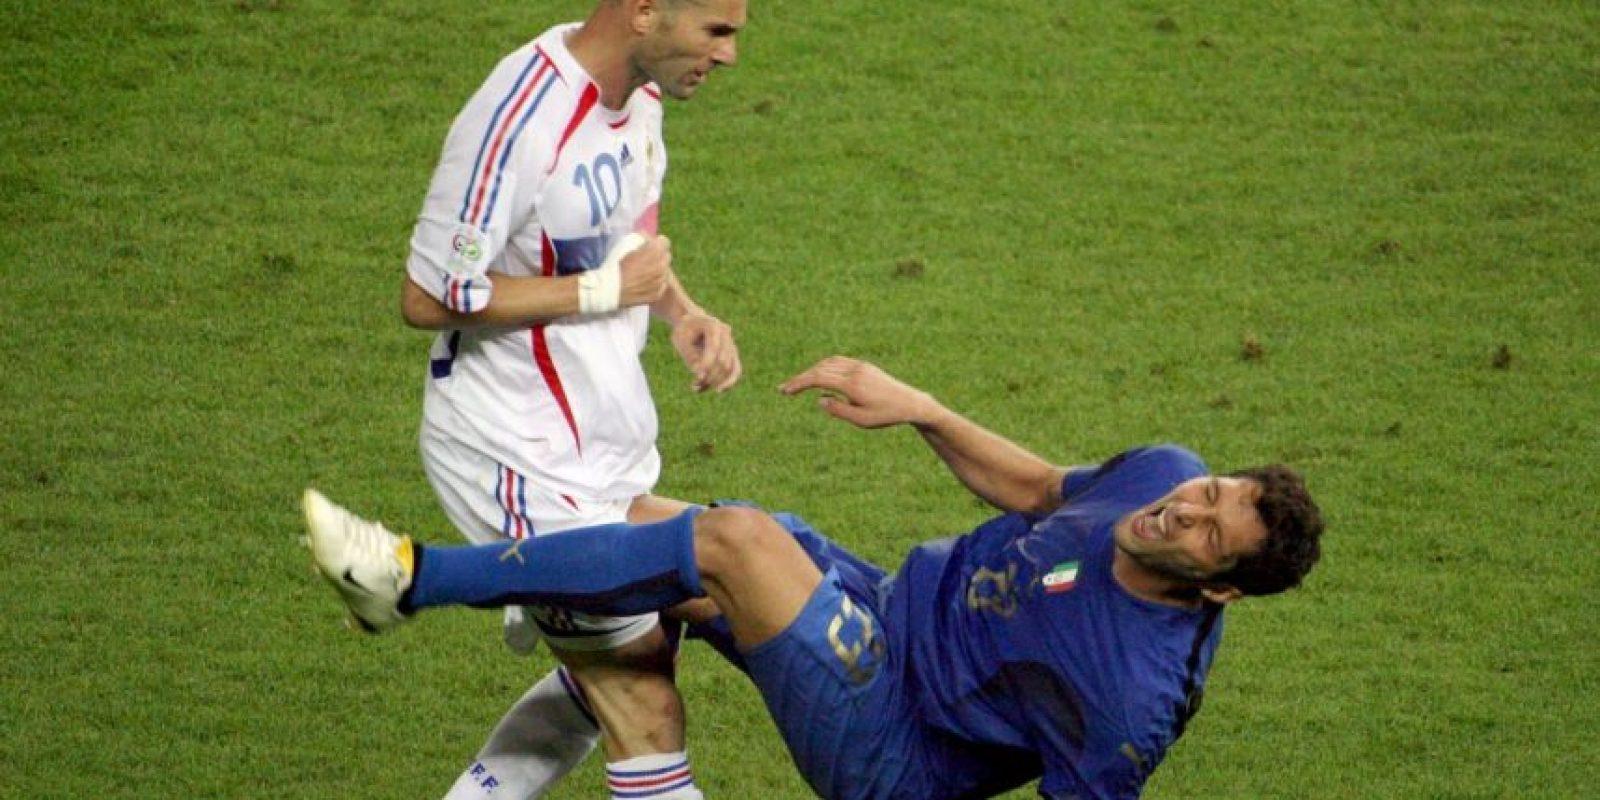 El cabezazo de Zinedine Zidane a Marco Materazzi, en el Mundia de Alemania 2006. Foto:AFP